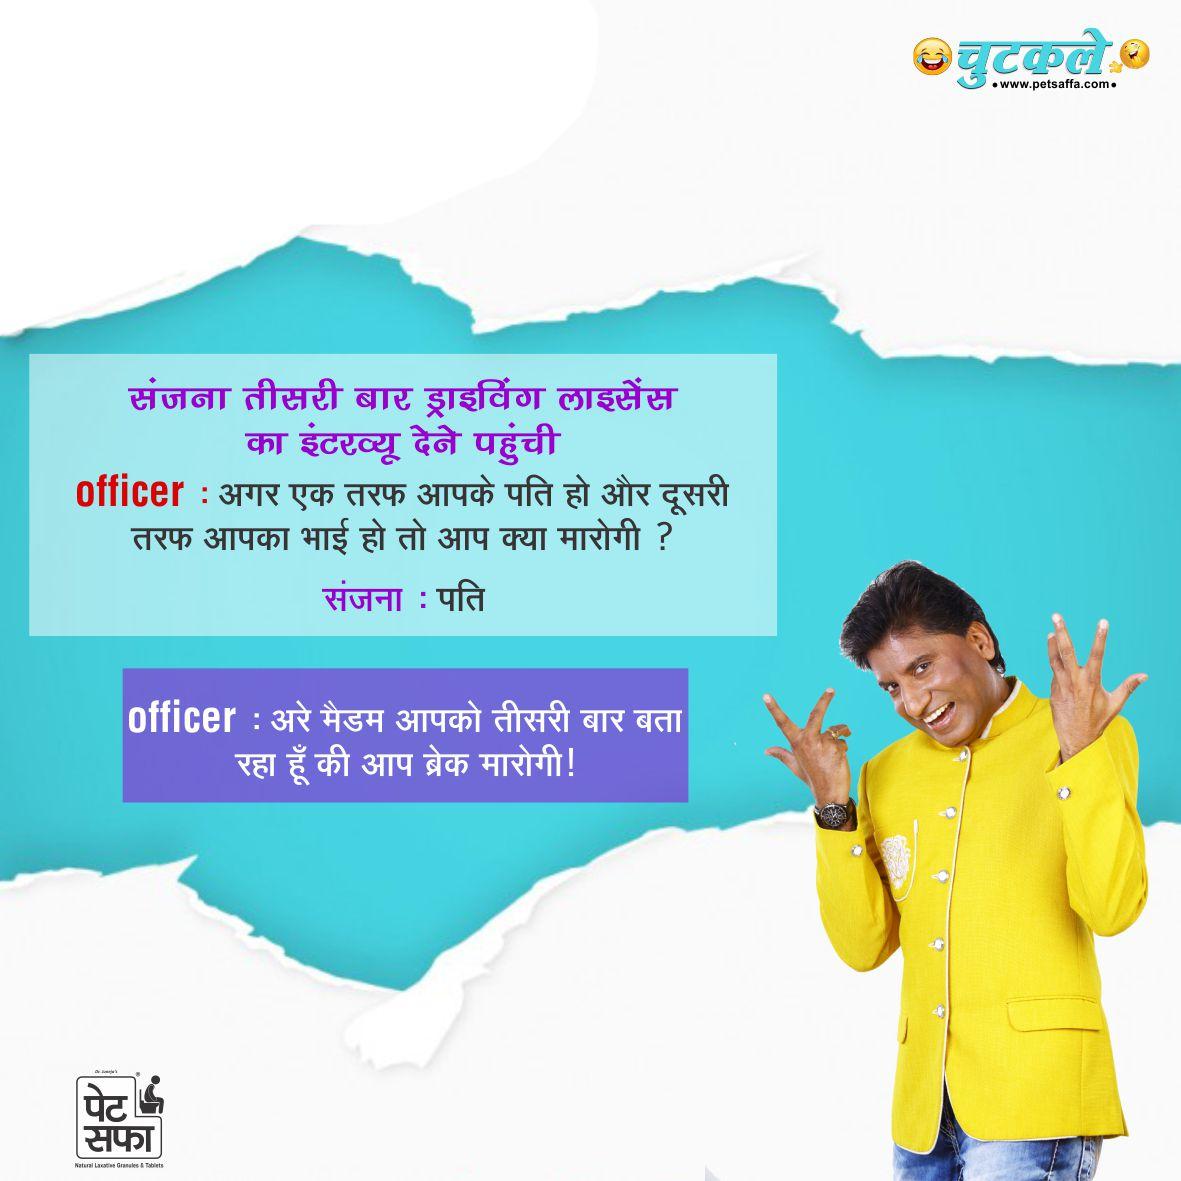 Hindi Funny Jokes of the Day